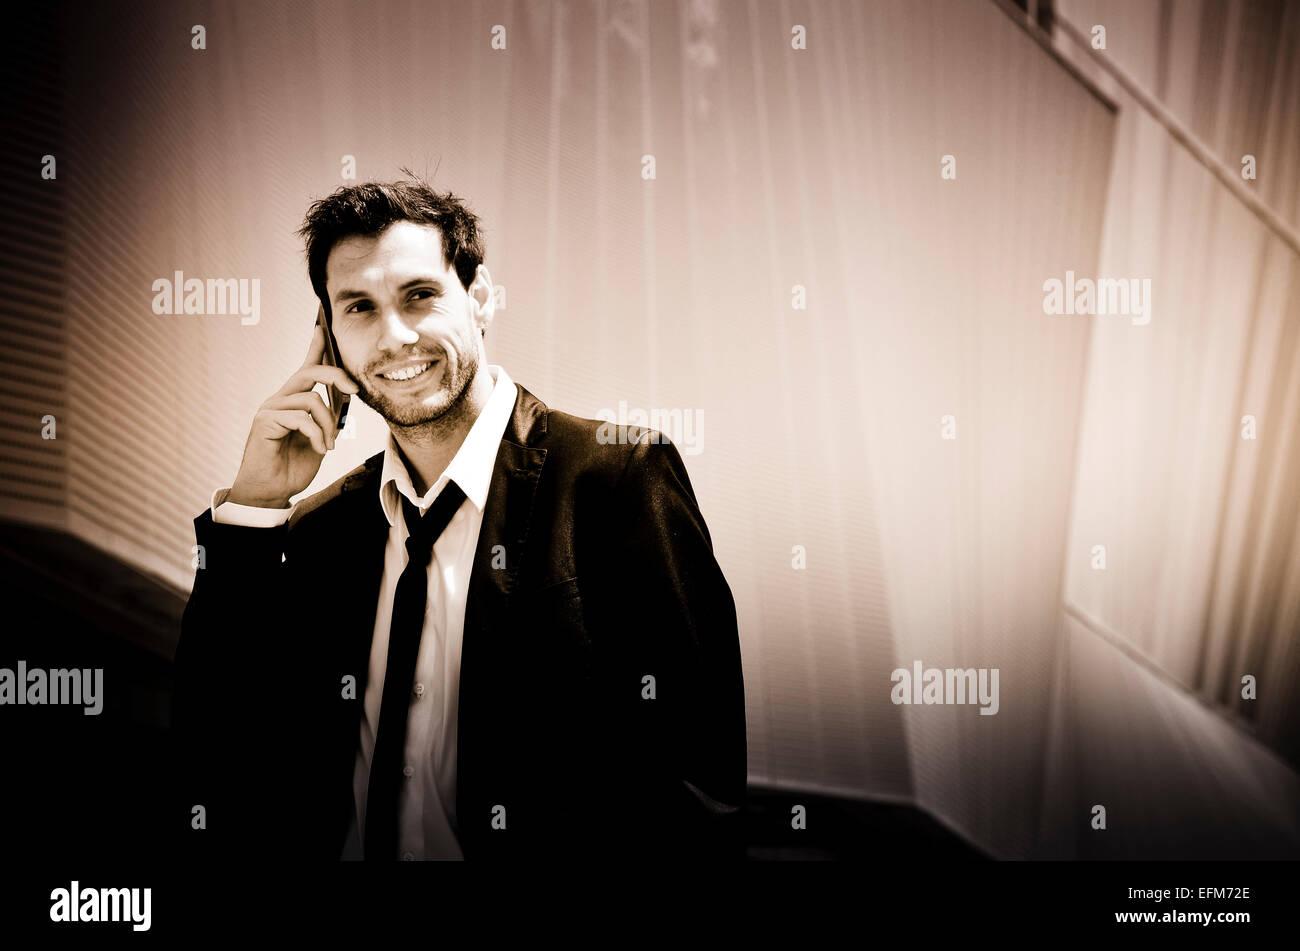 Businessman. - Stock Image